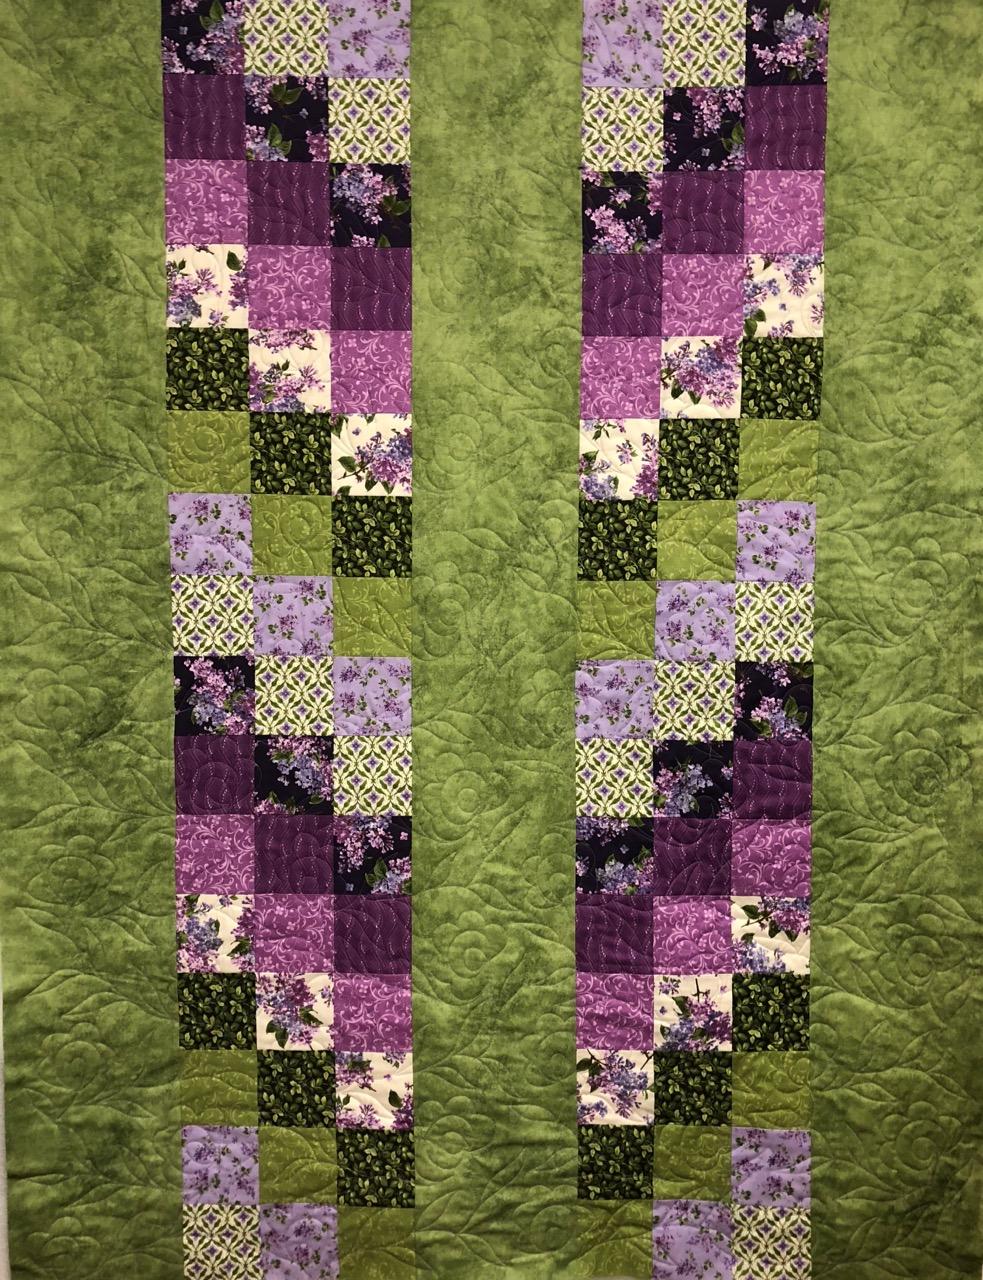 0911 bees knees lavendar